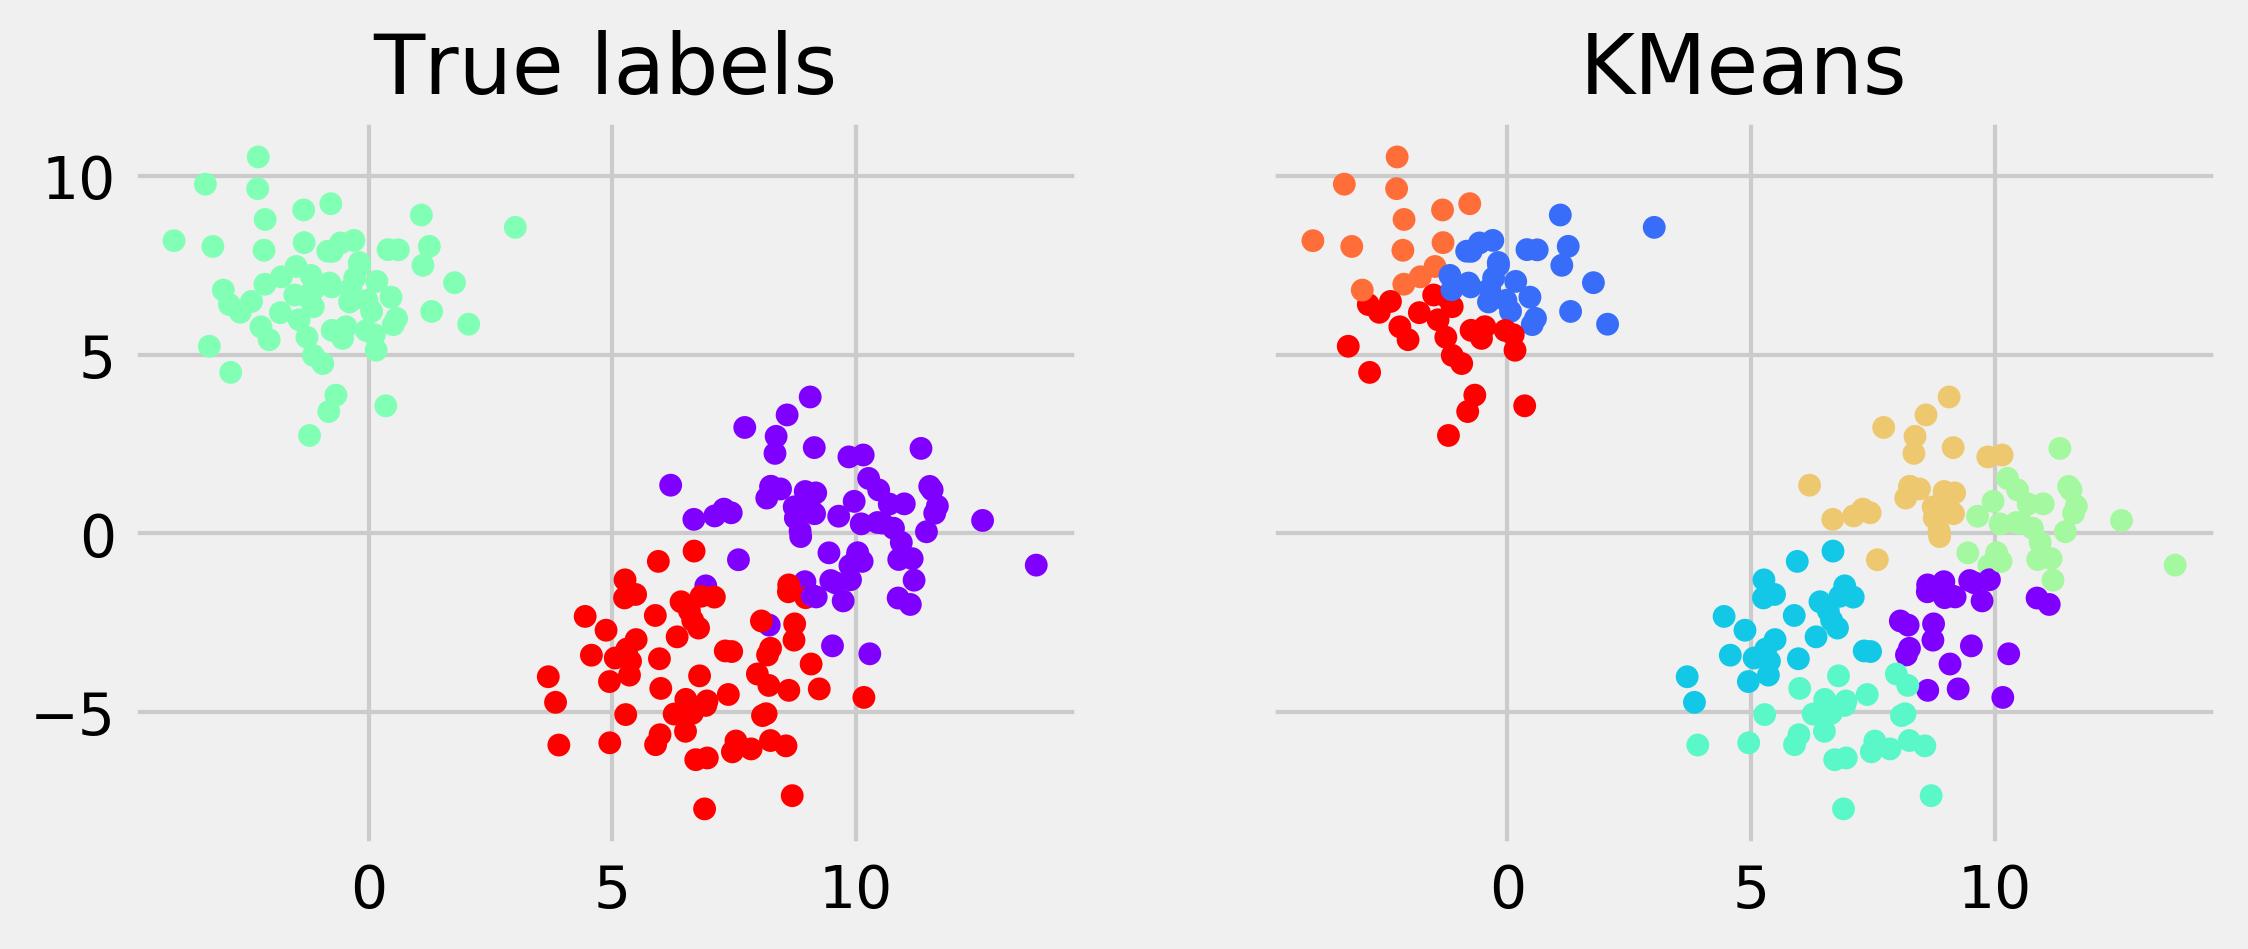 <matplotlib.figure.Figure at 0x8110198>